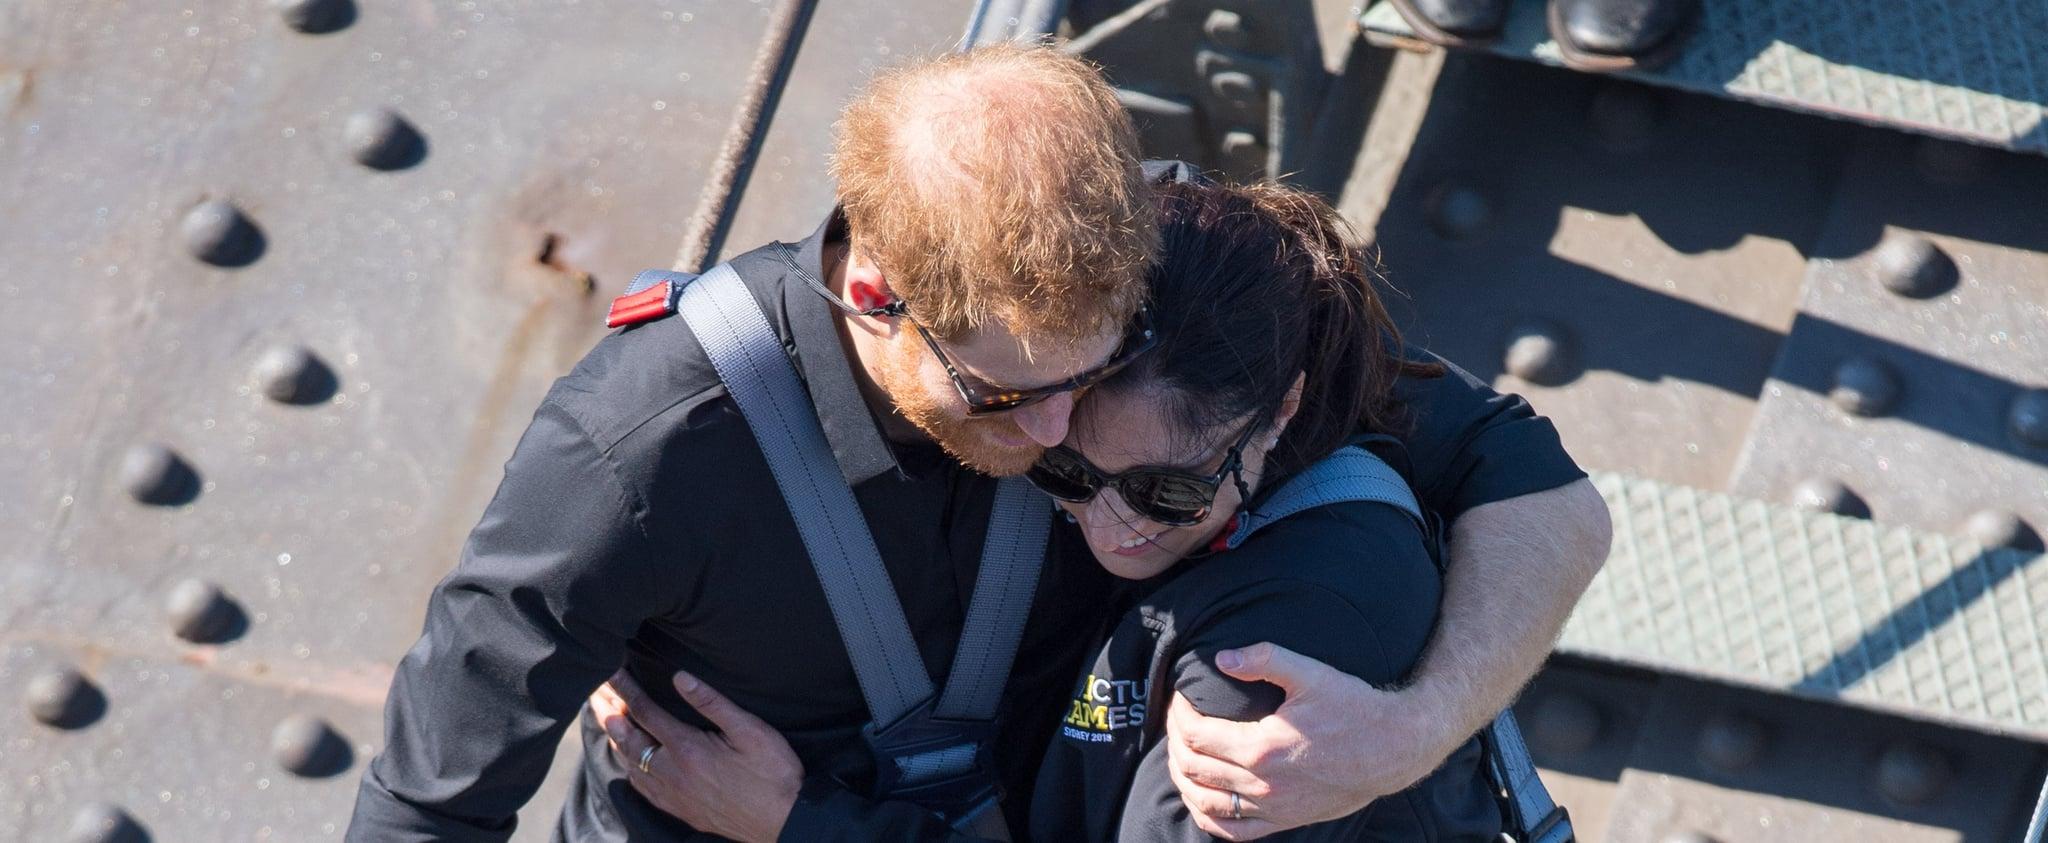 Prince Harry Comforts a Military Widow in Australia 2018